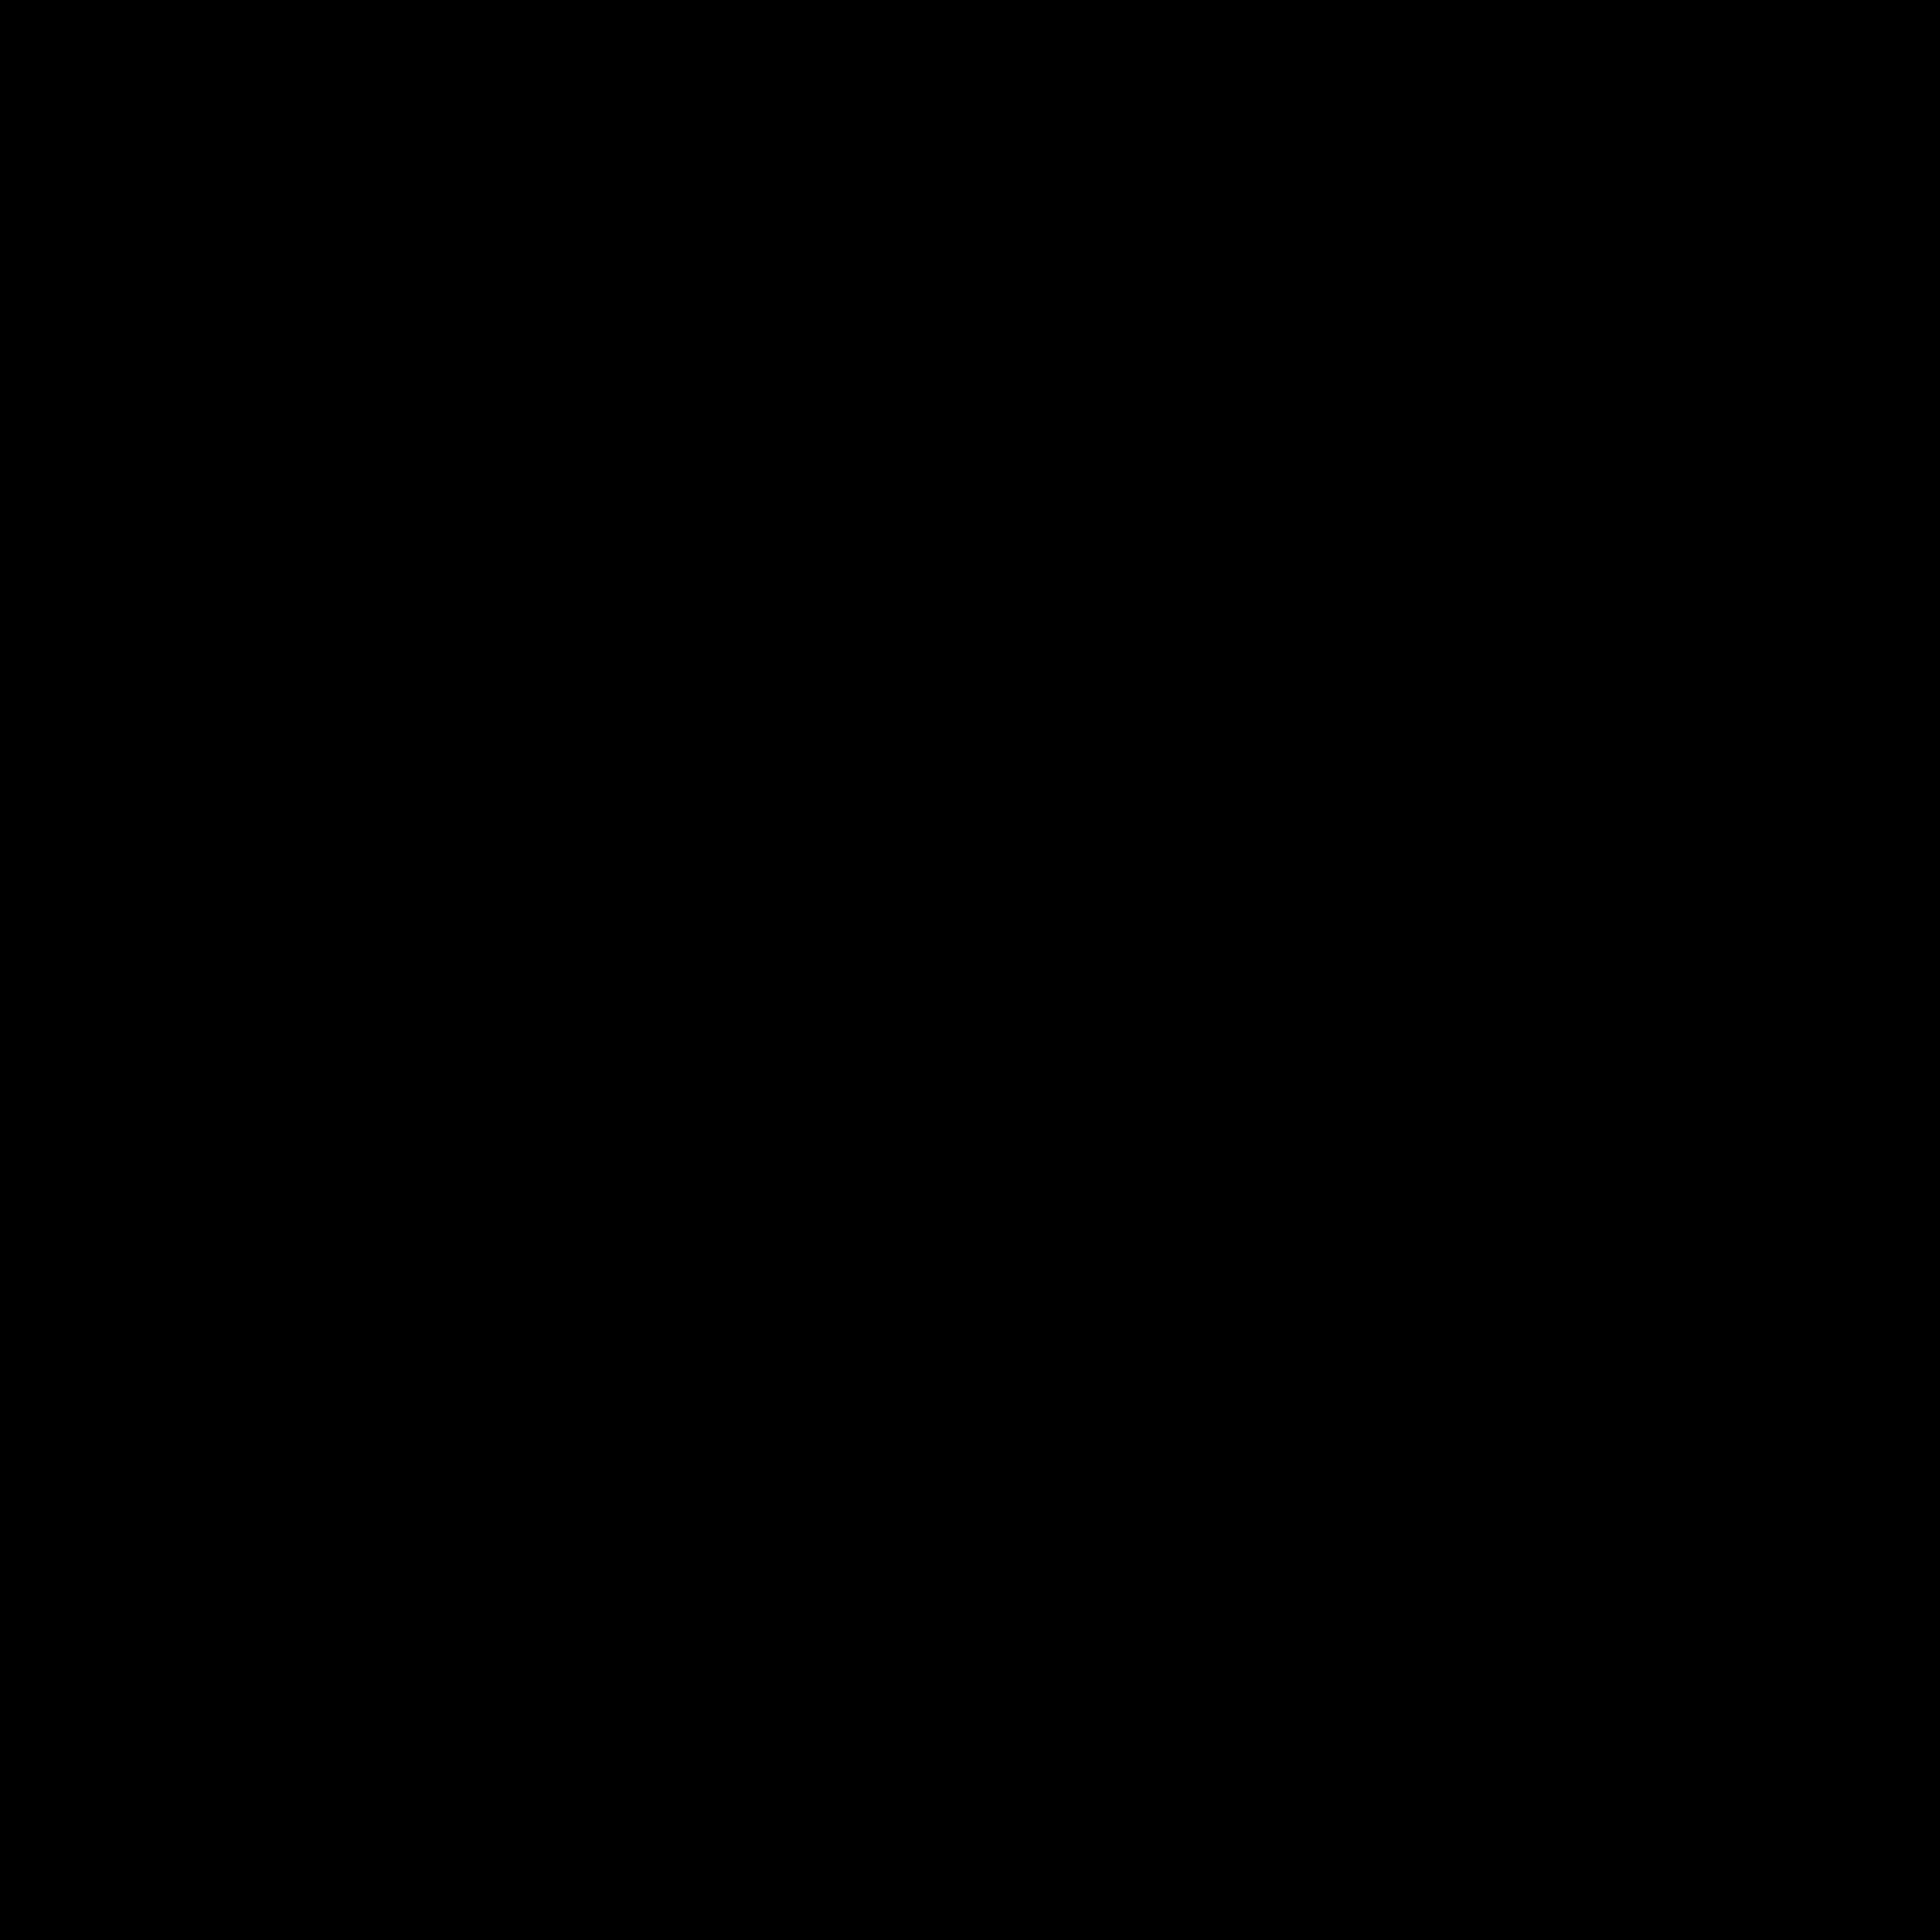 blackrock logo 0 - BlackRock Logo